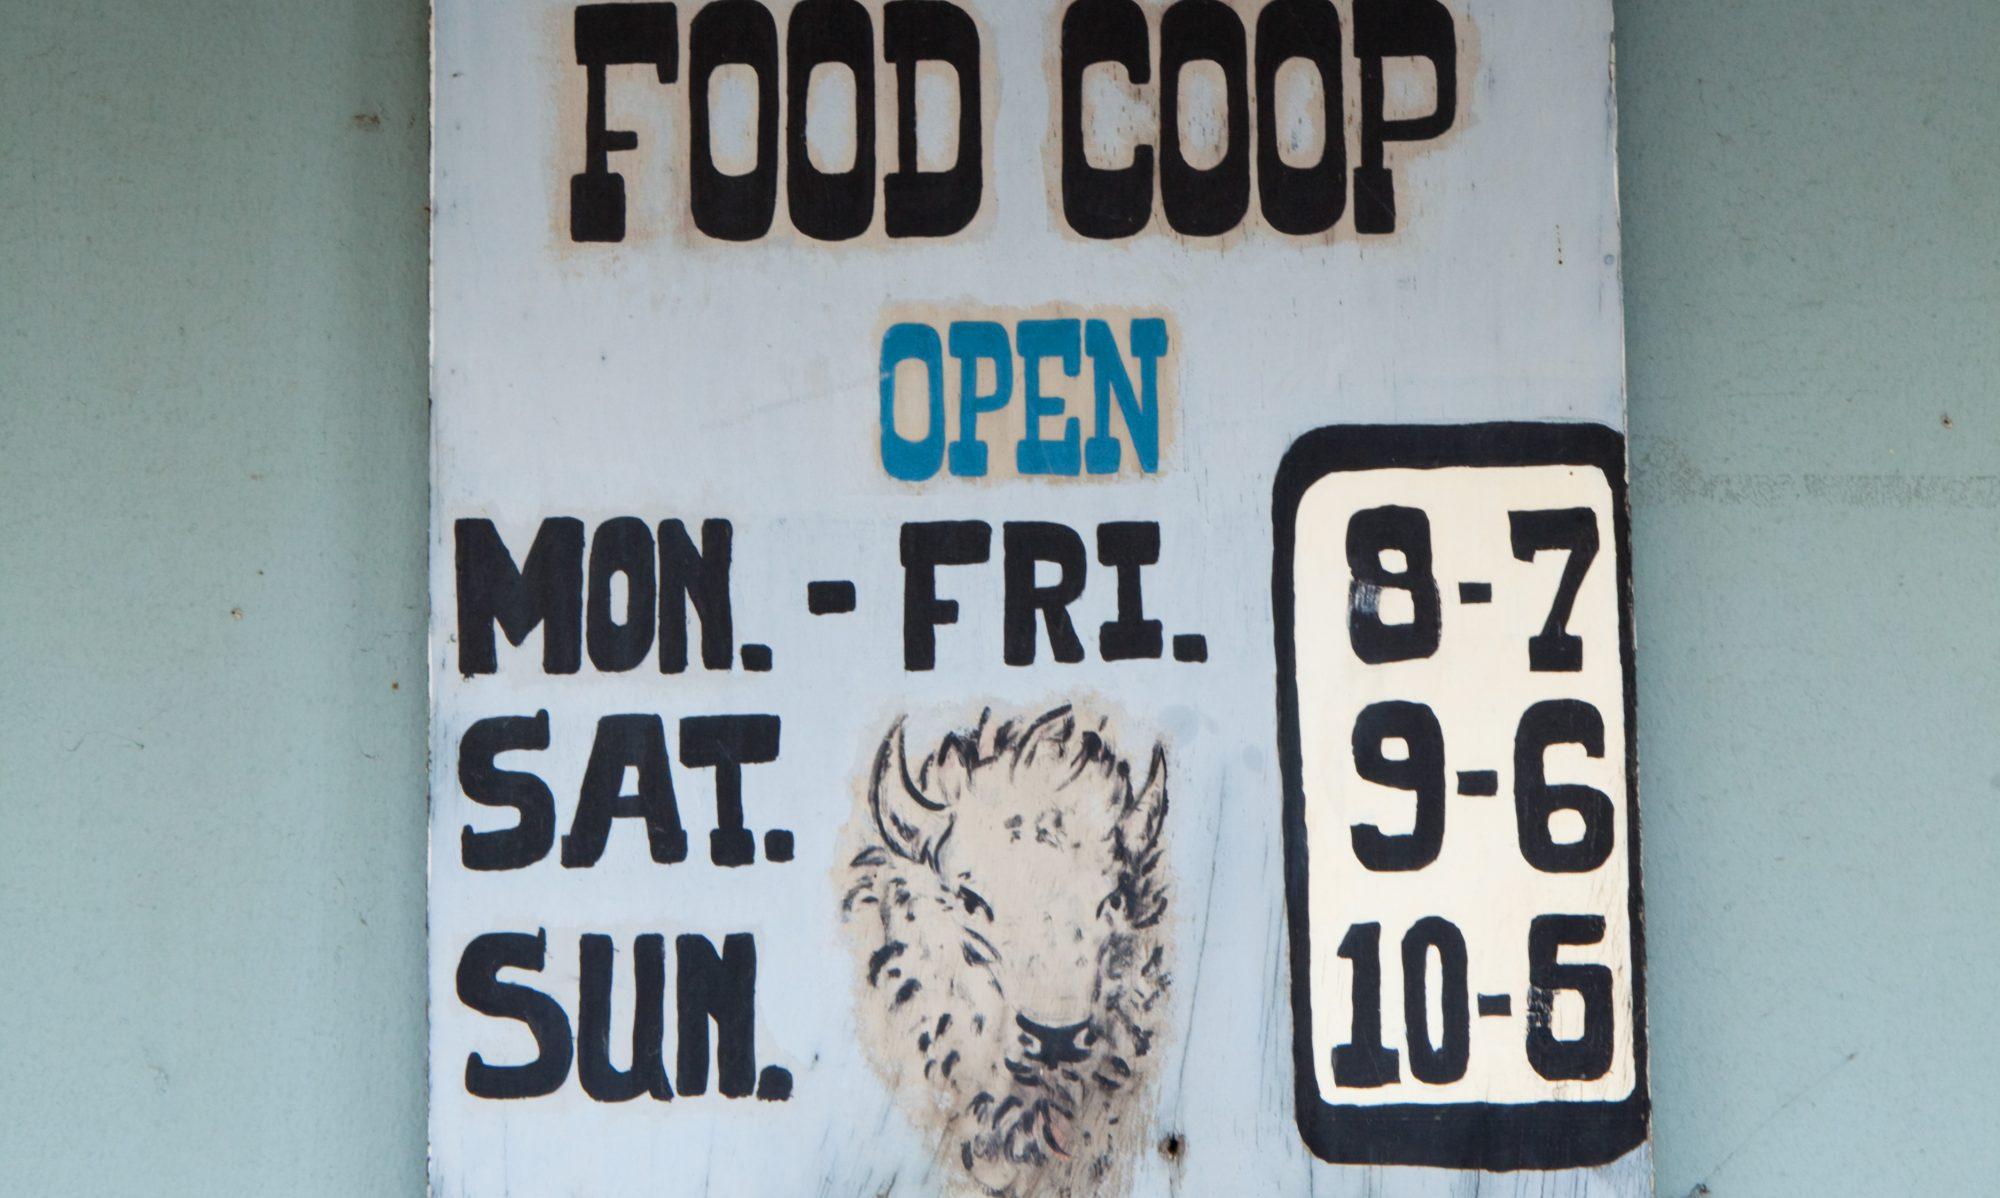 BUFFALO MOUNTAIN FOOD COOP & CAFE